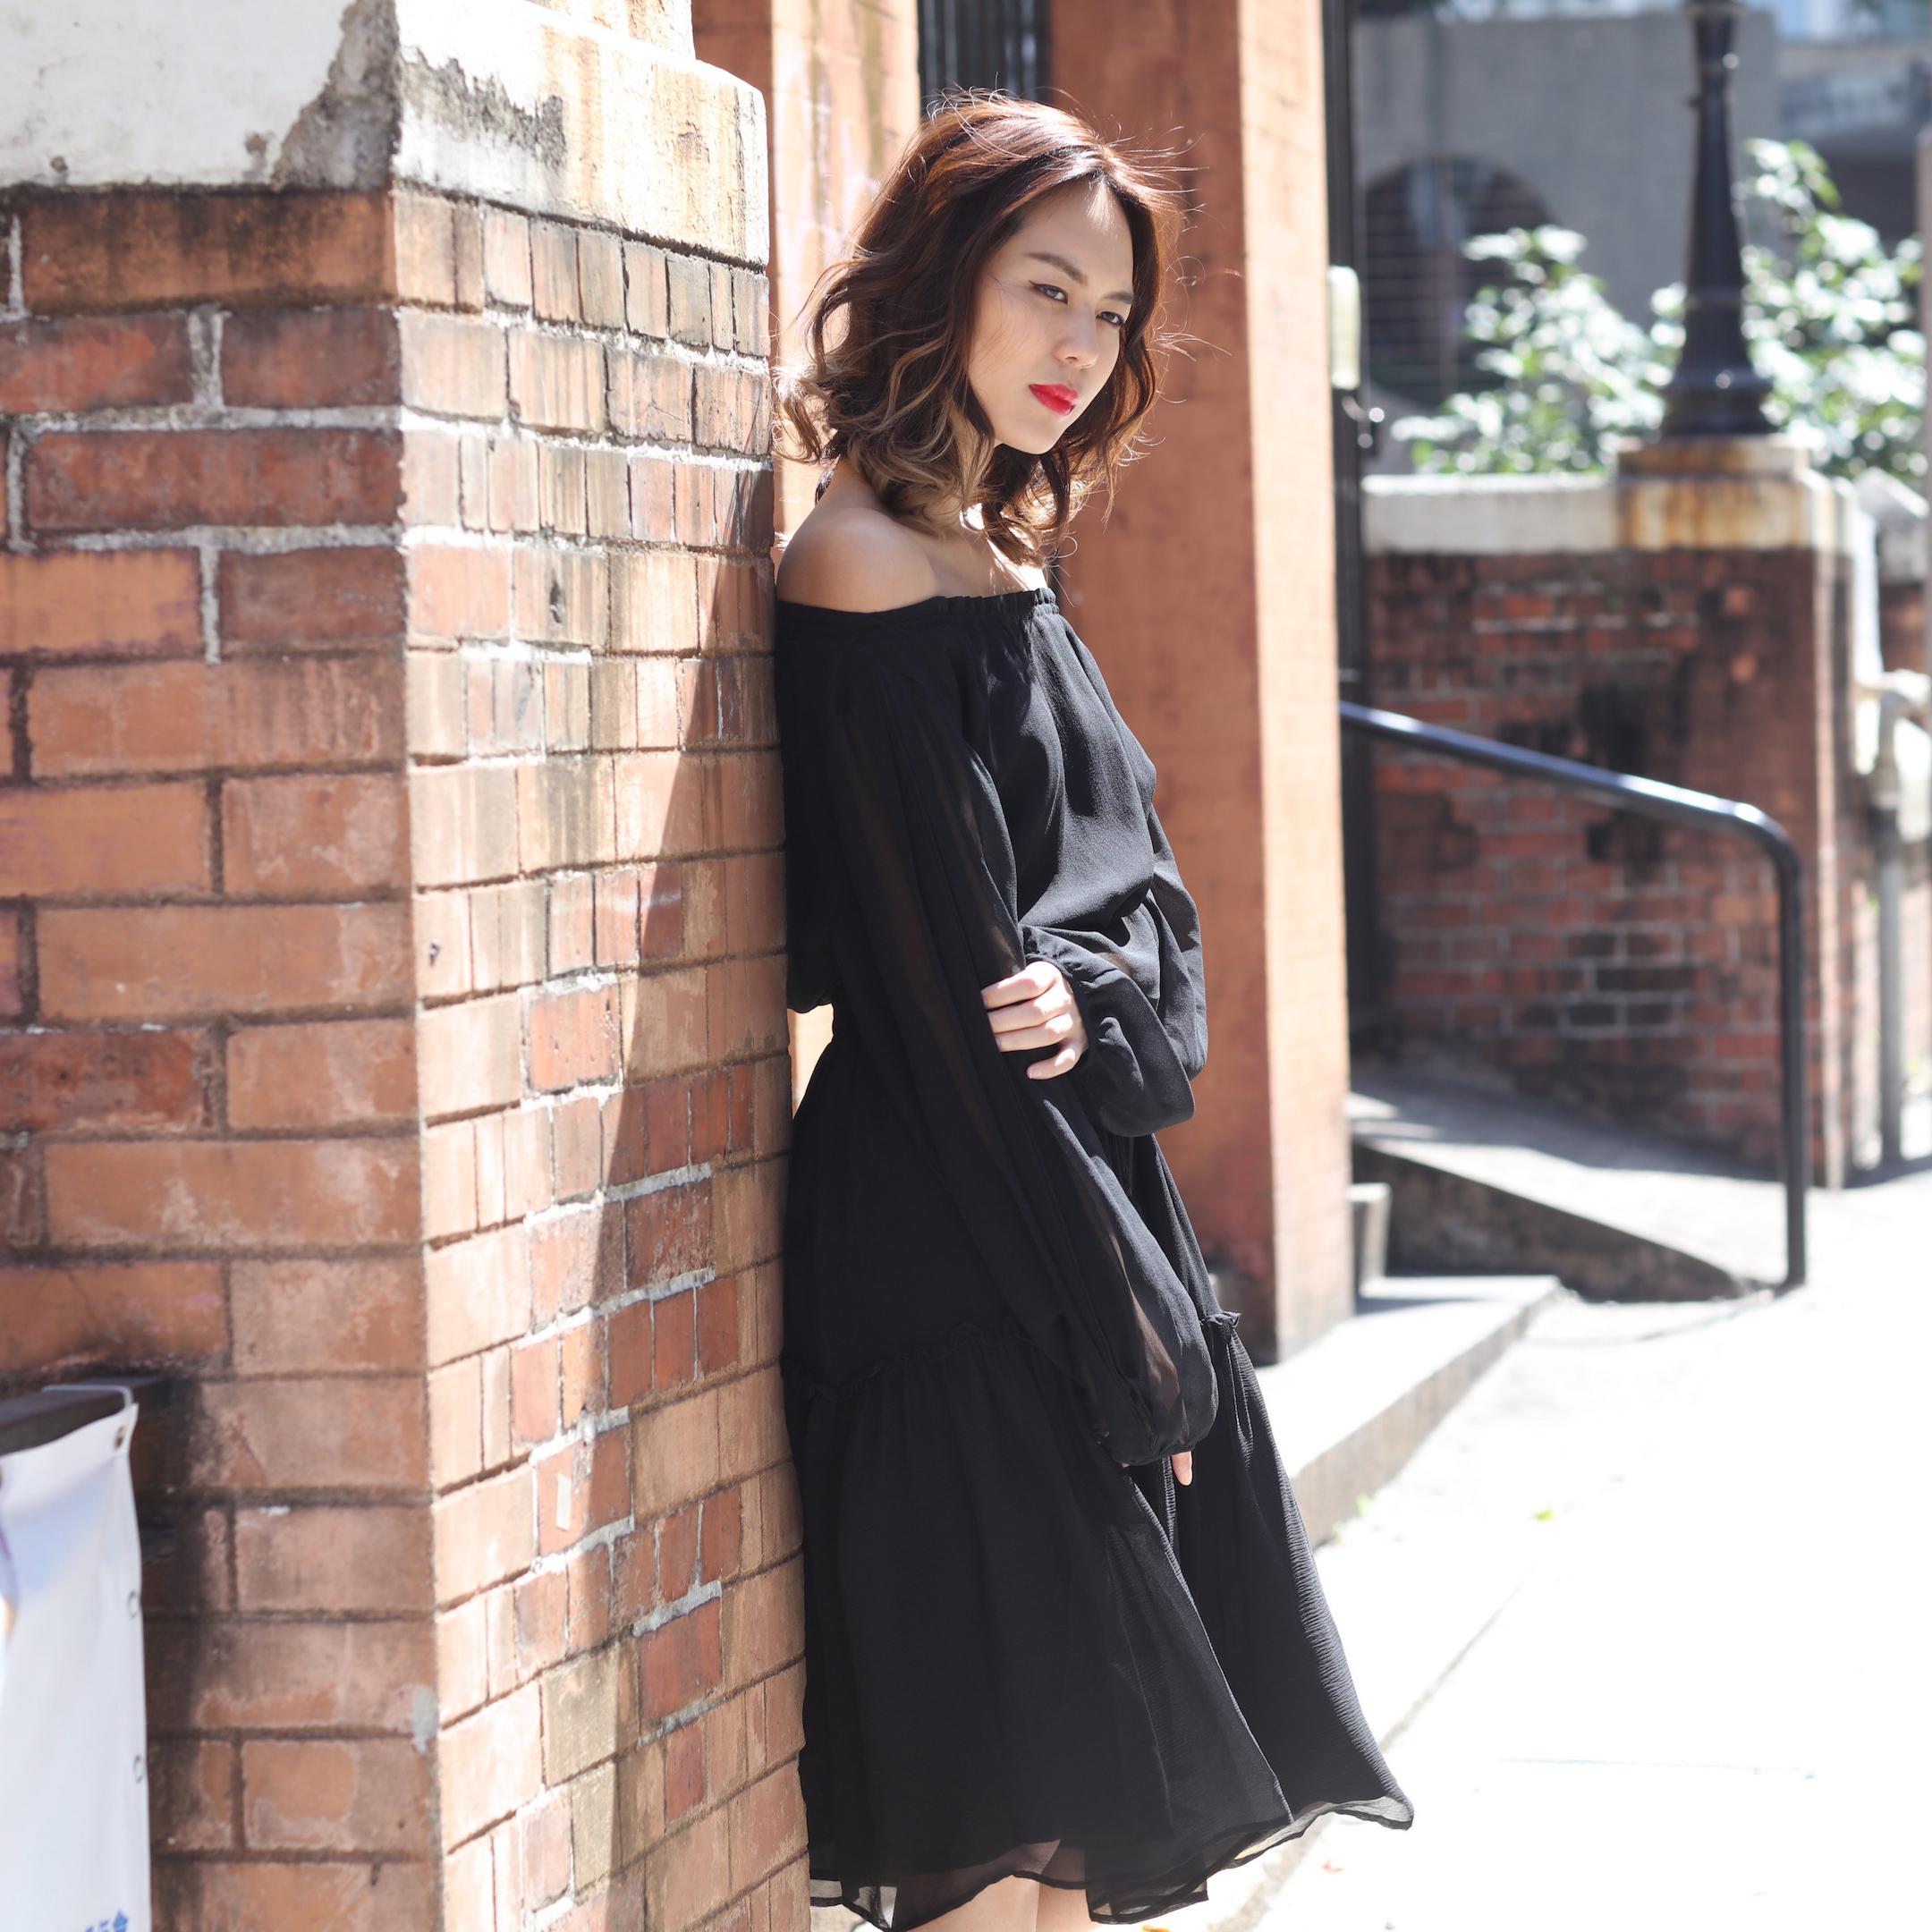 Karen_Behind the scene_3.JPG